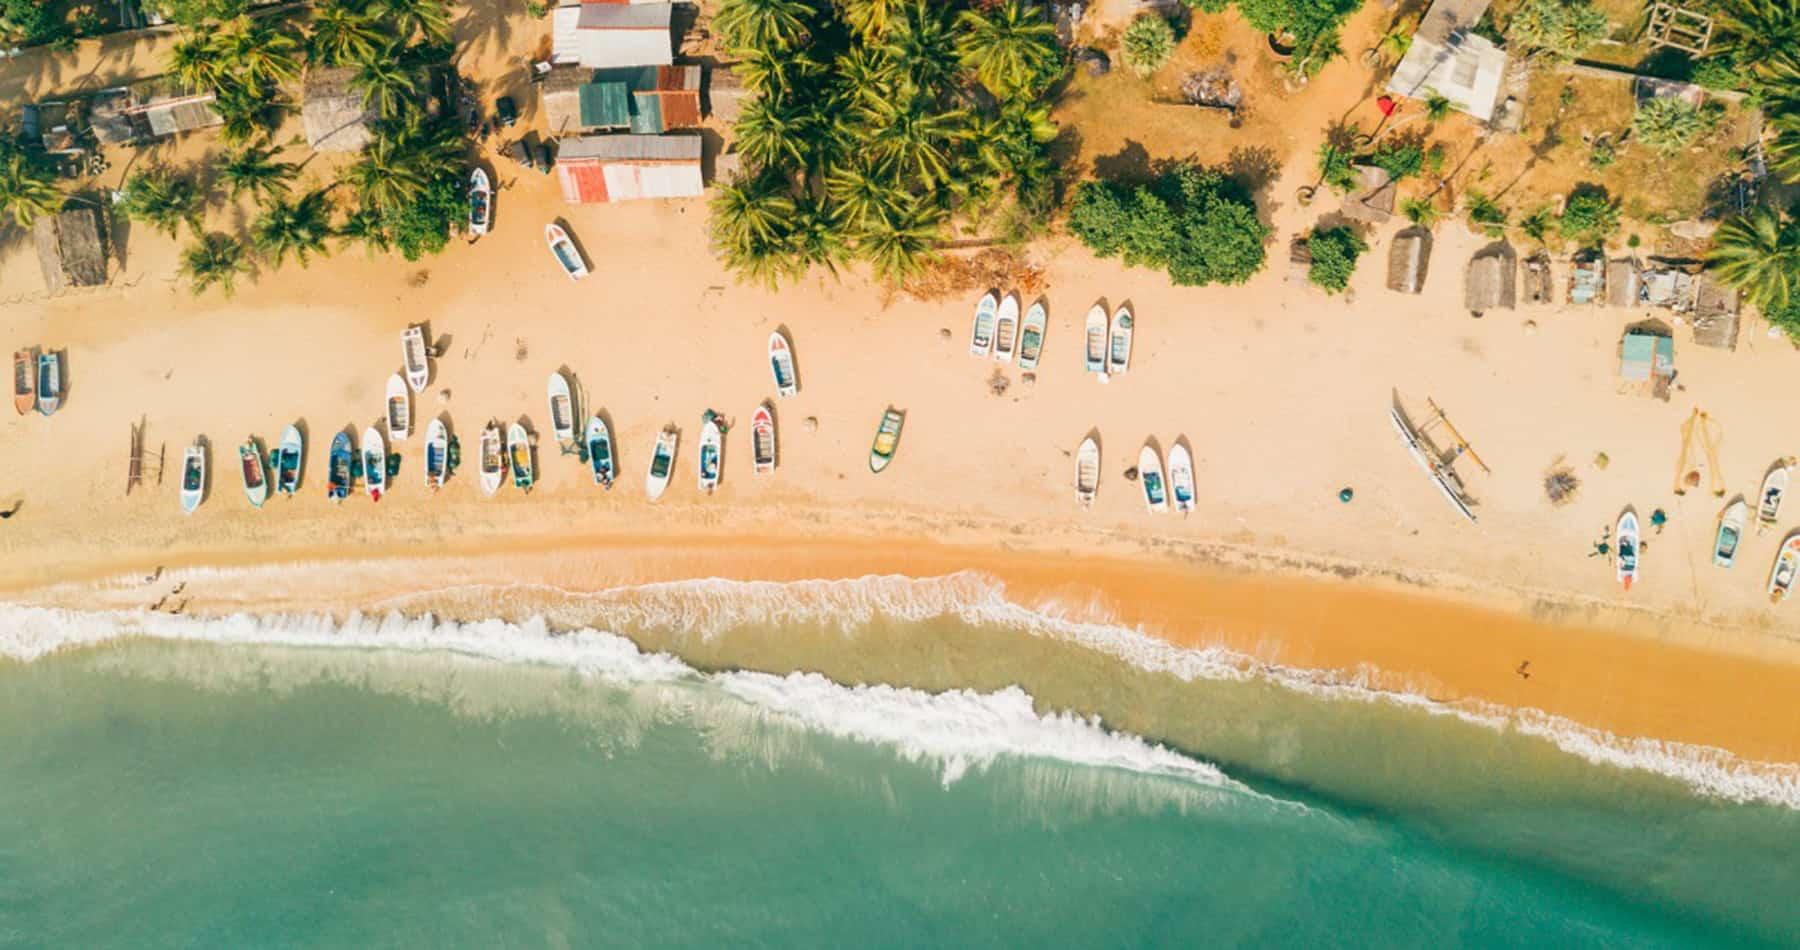 Sri Lanka surfing travel tips blog